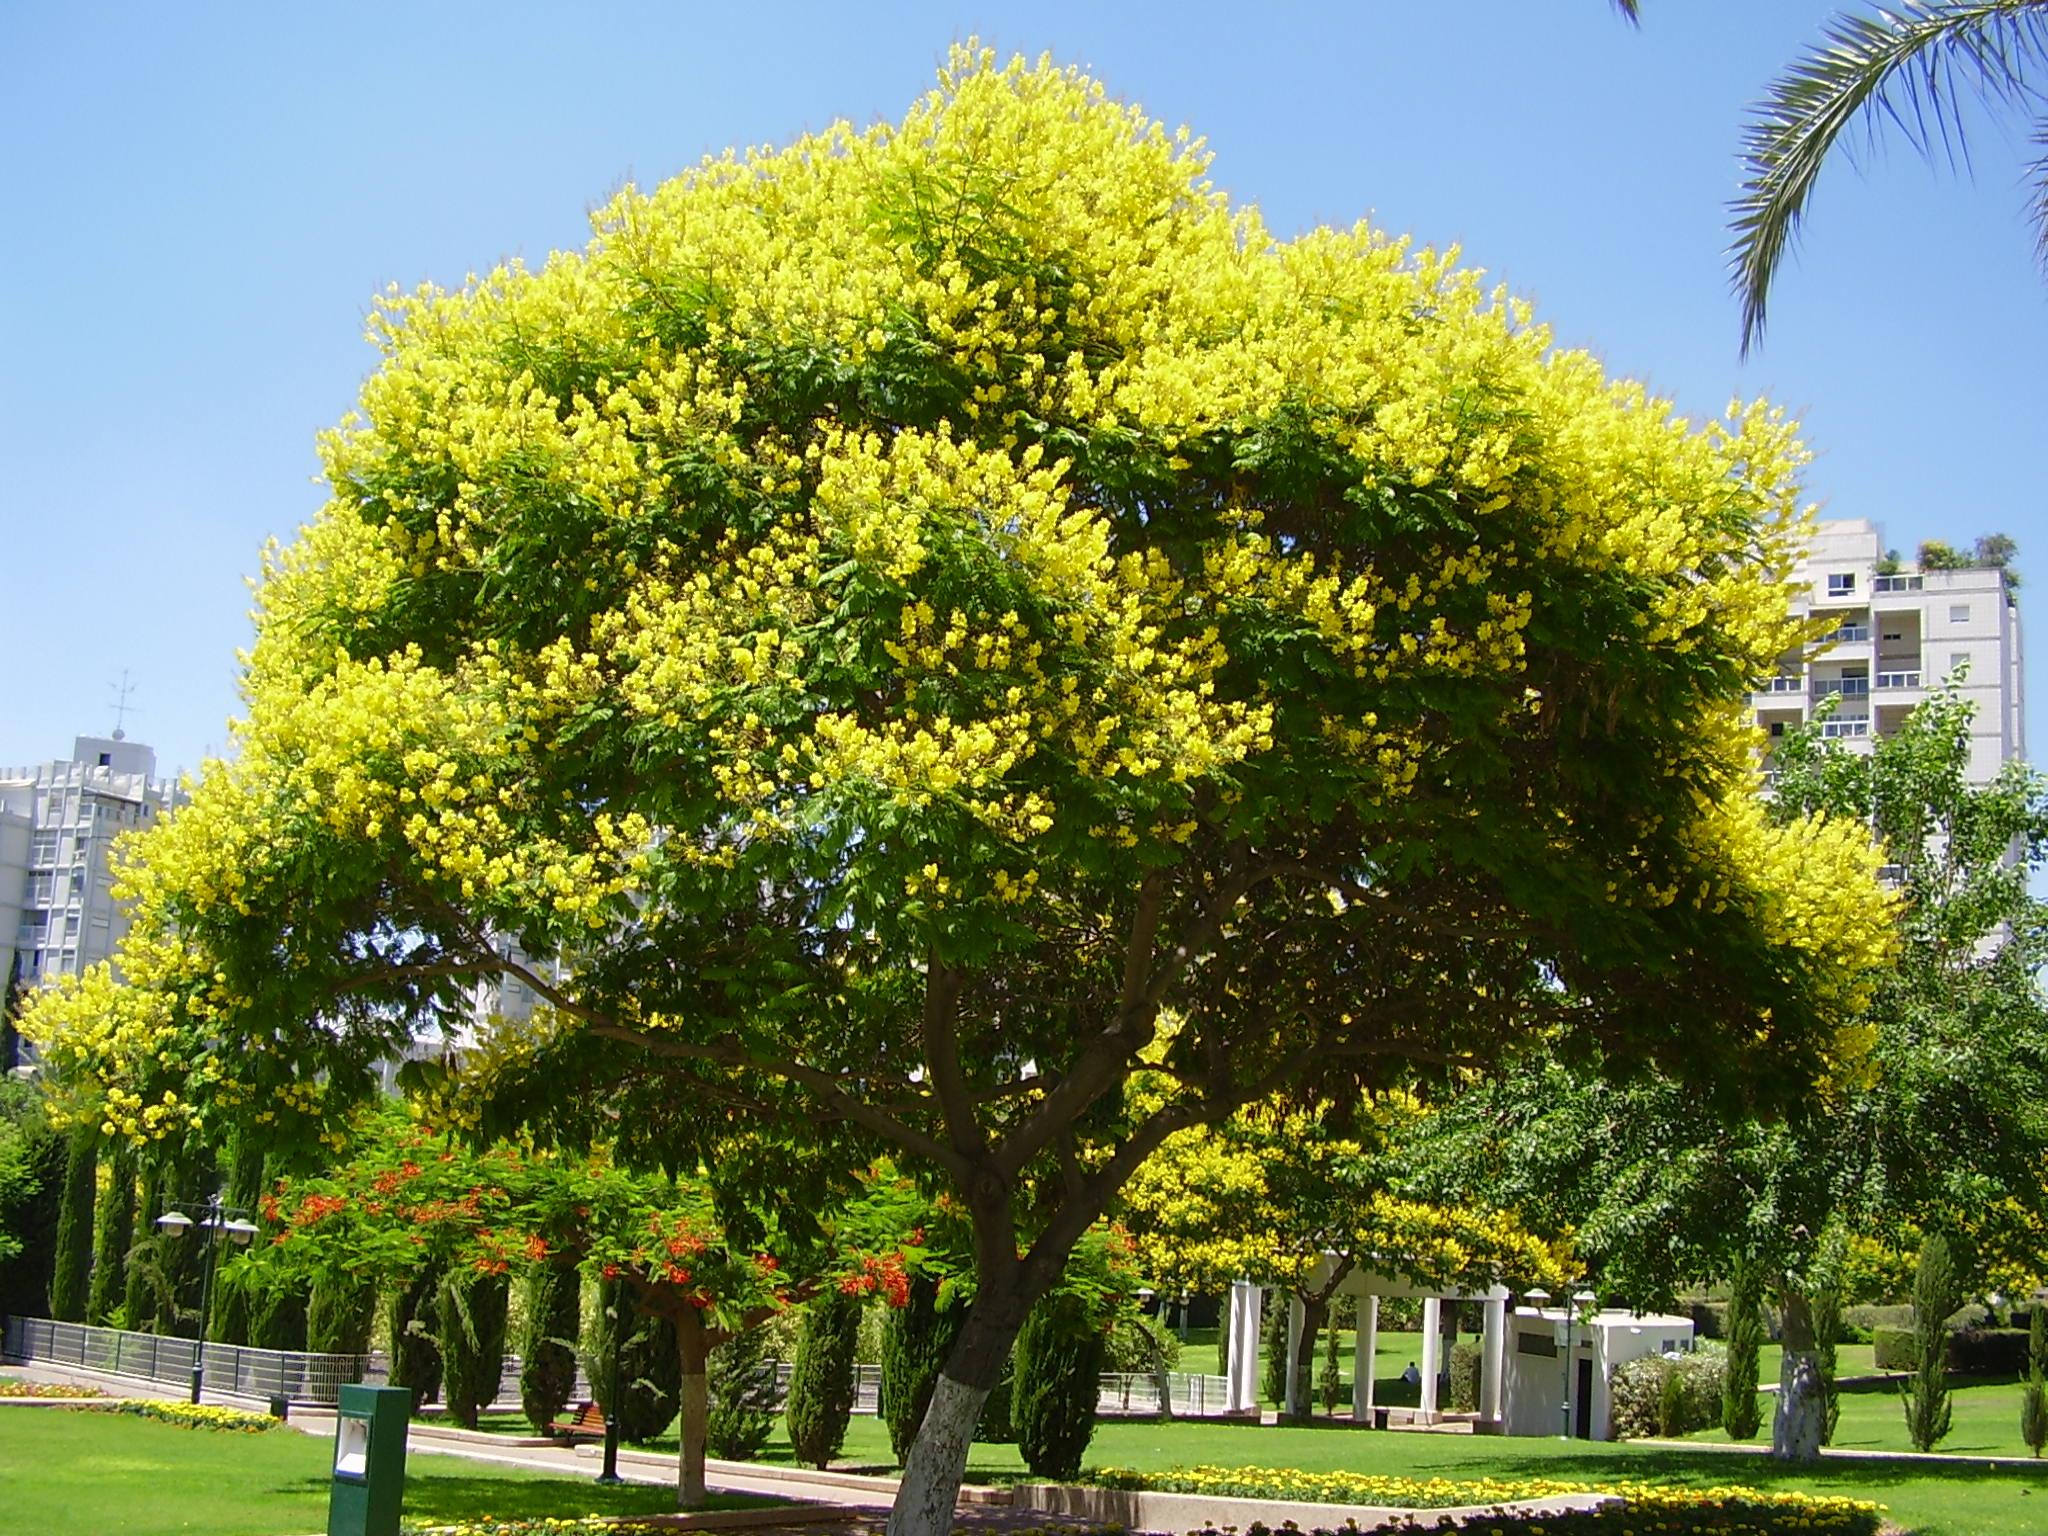 Peltophorum dubium wikiwand for Arboles de hoja perenne que crece rapido